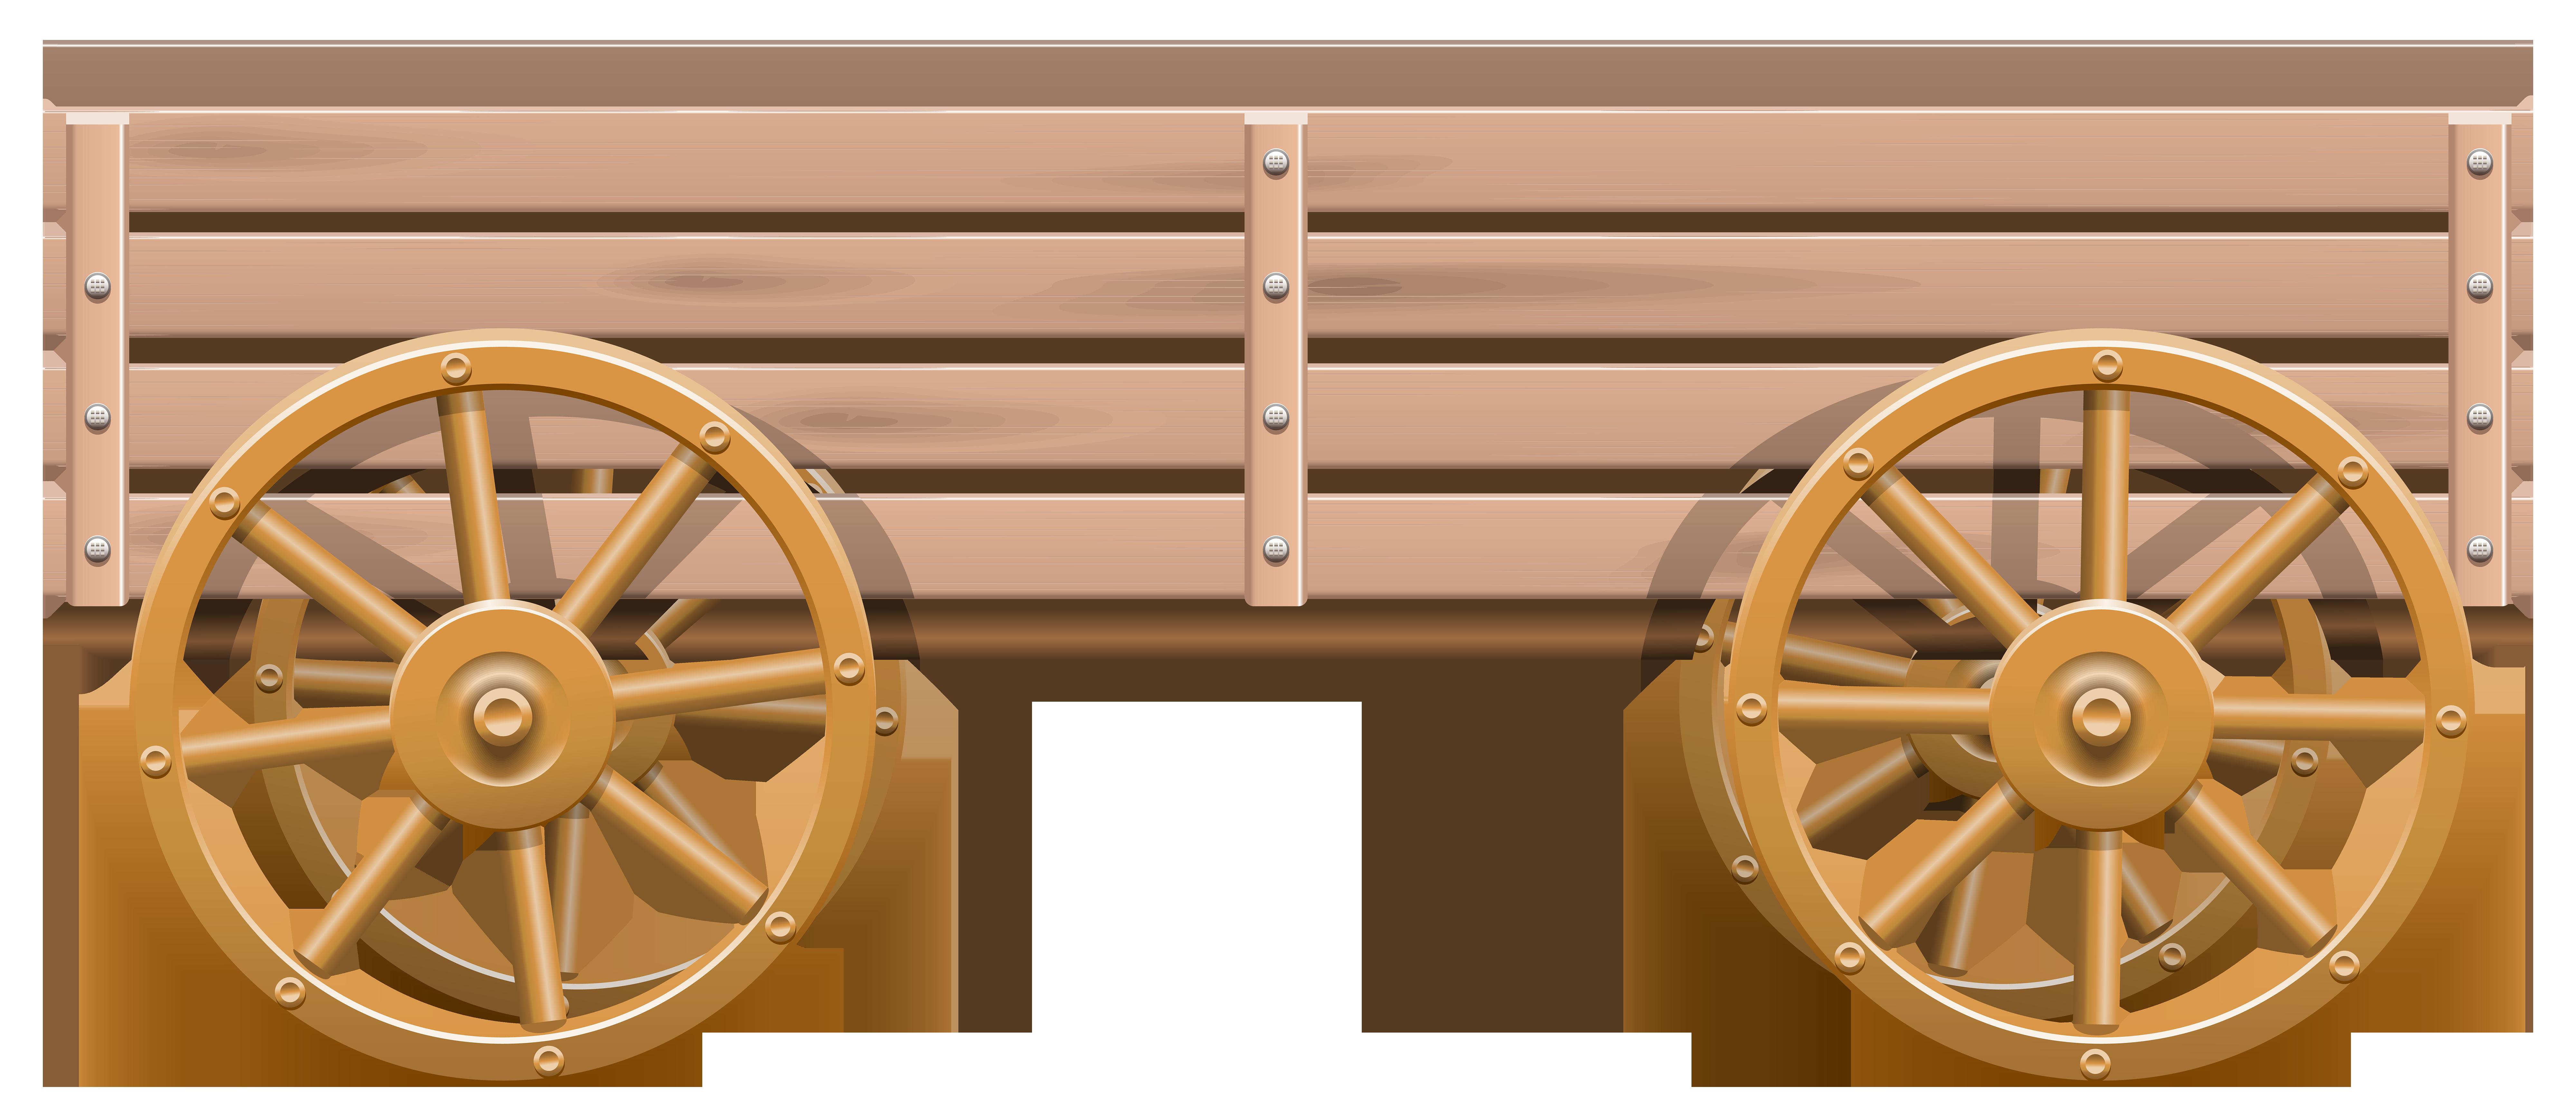 image transparent Cart clipart. Wooden png clip art